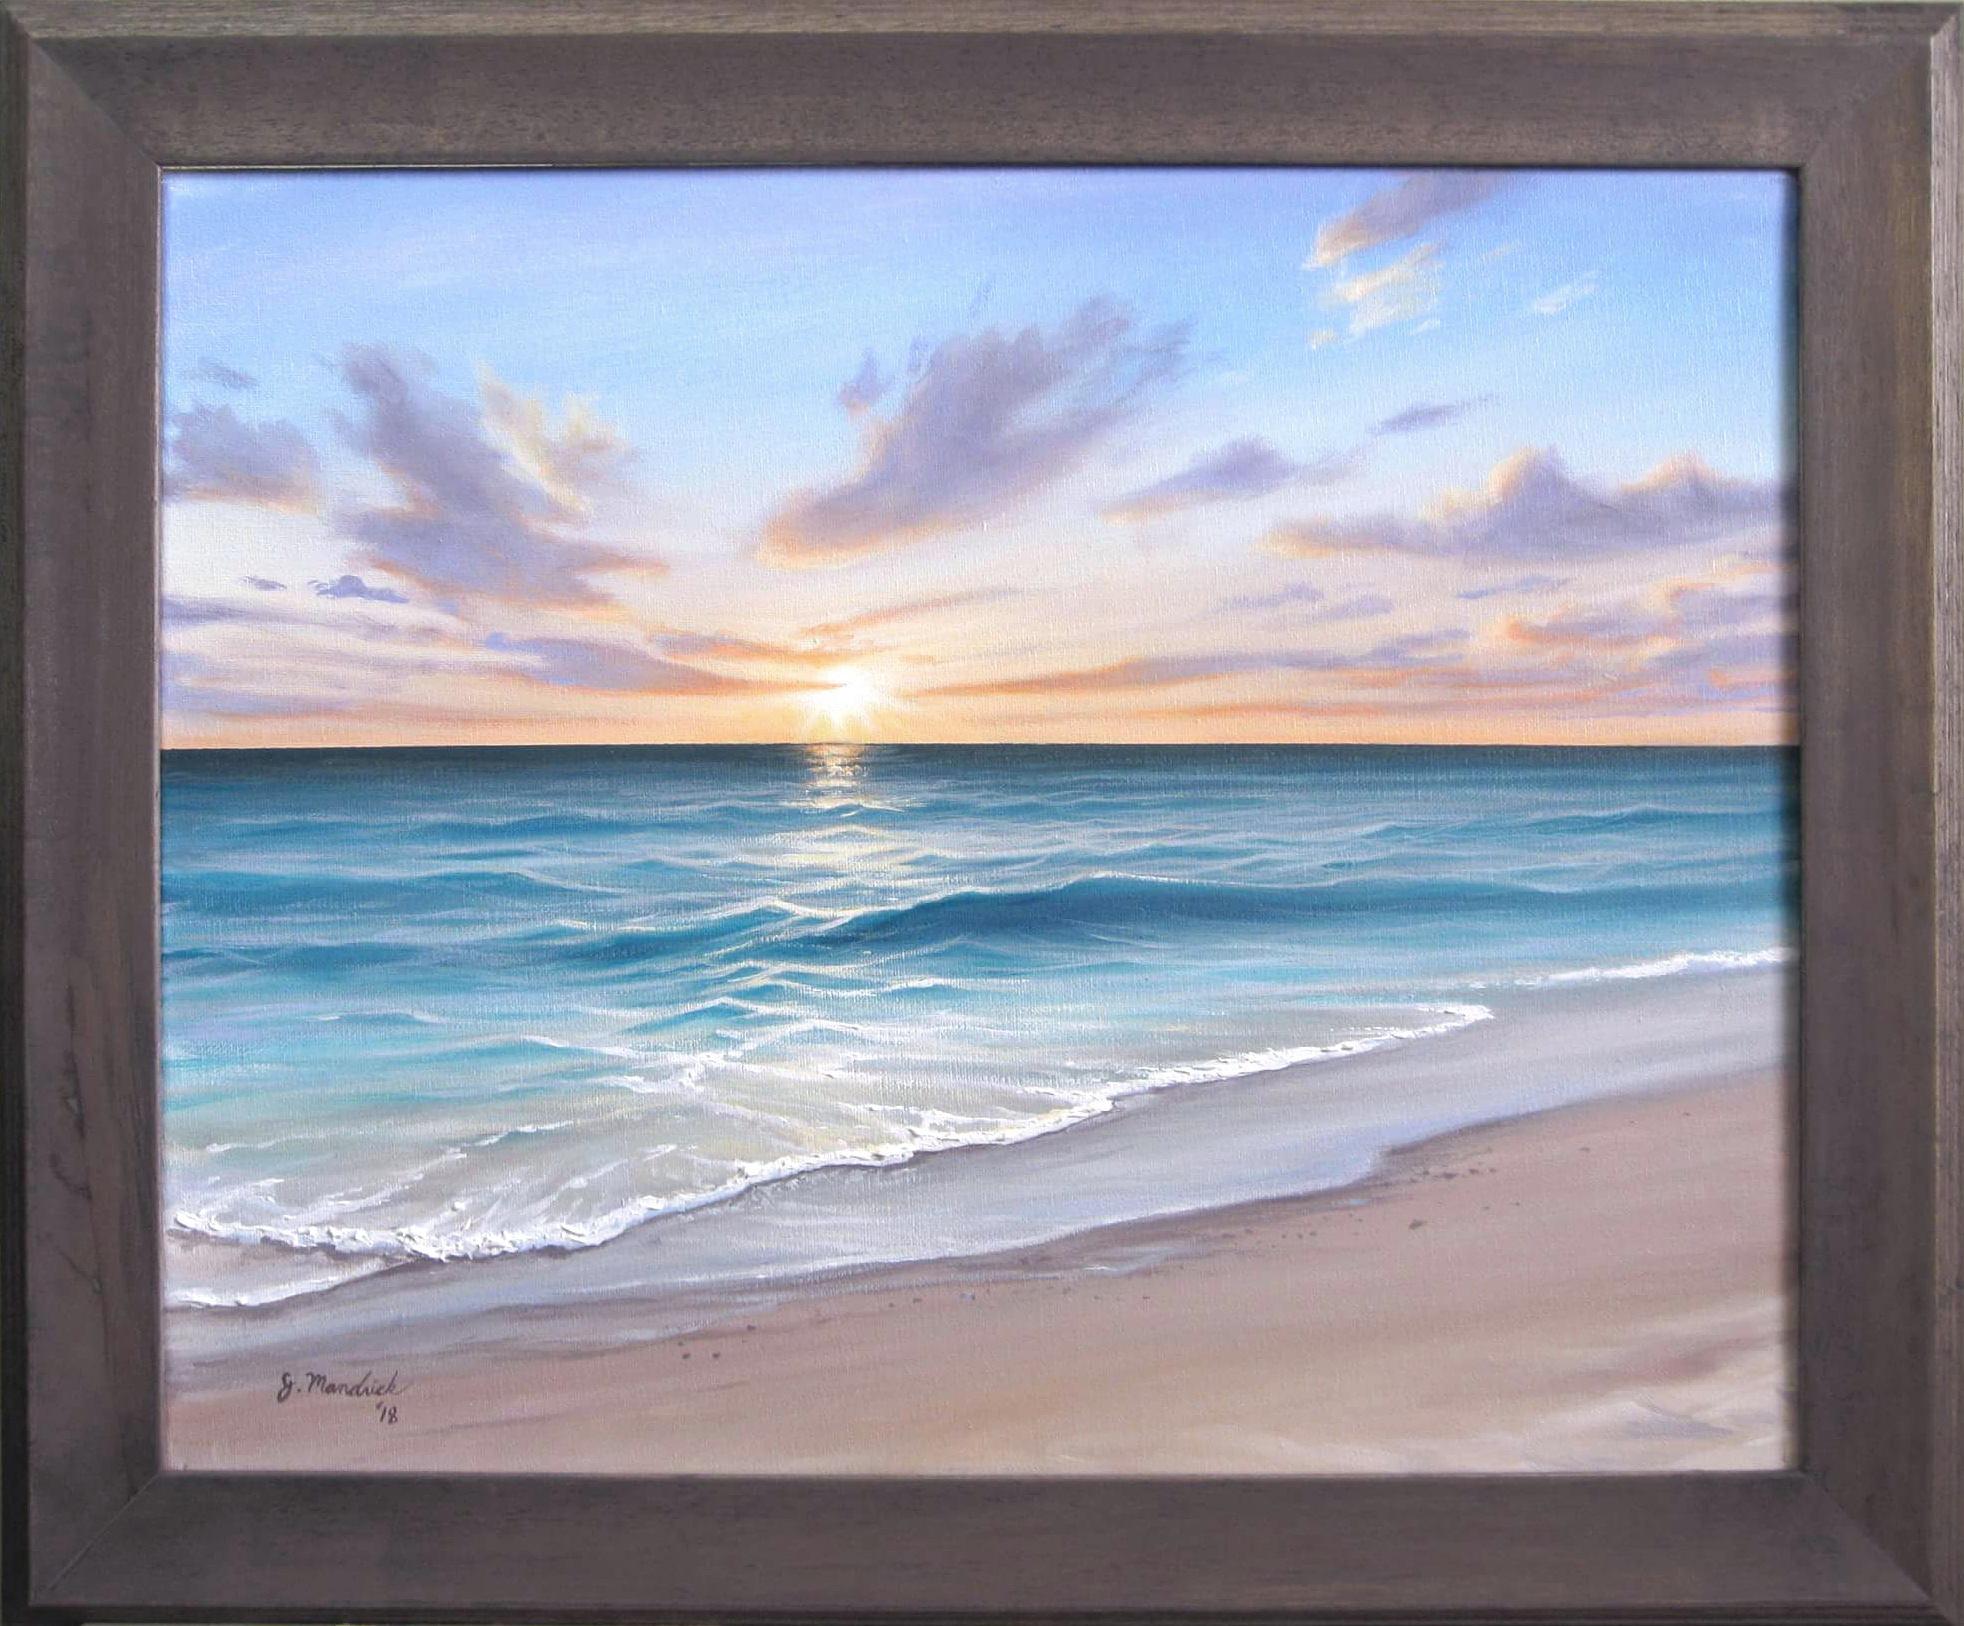 Original 16x20 Ocean Beach Sunrise Painting on Canvas by J.